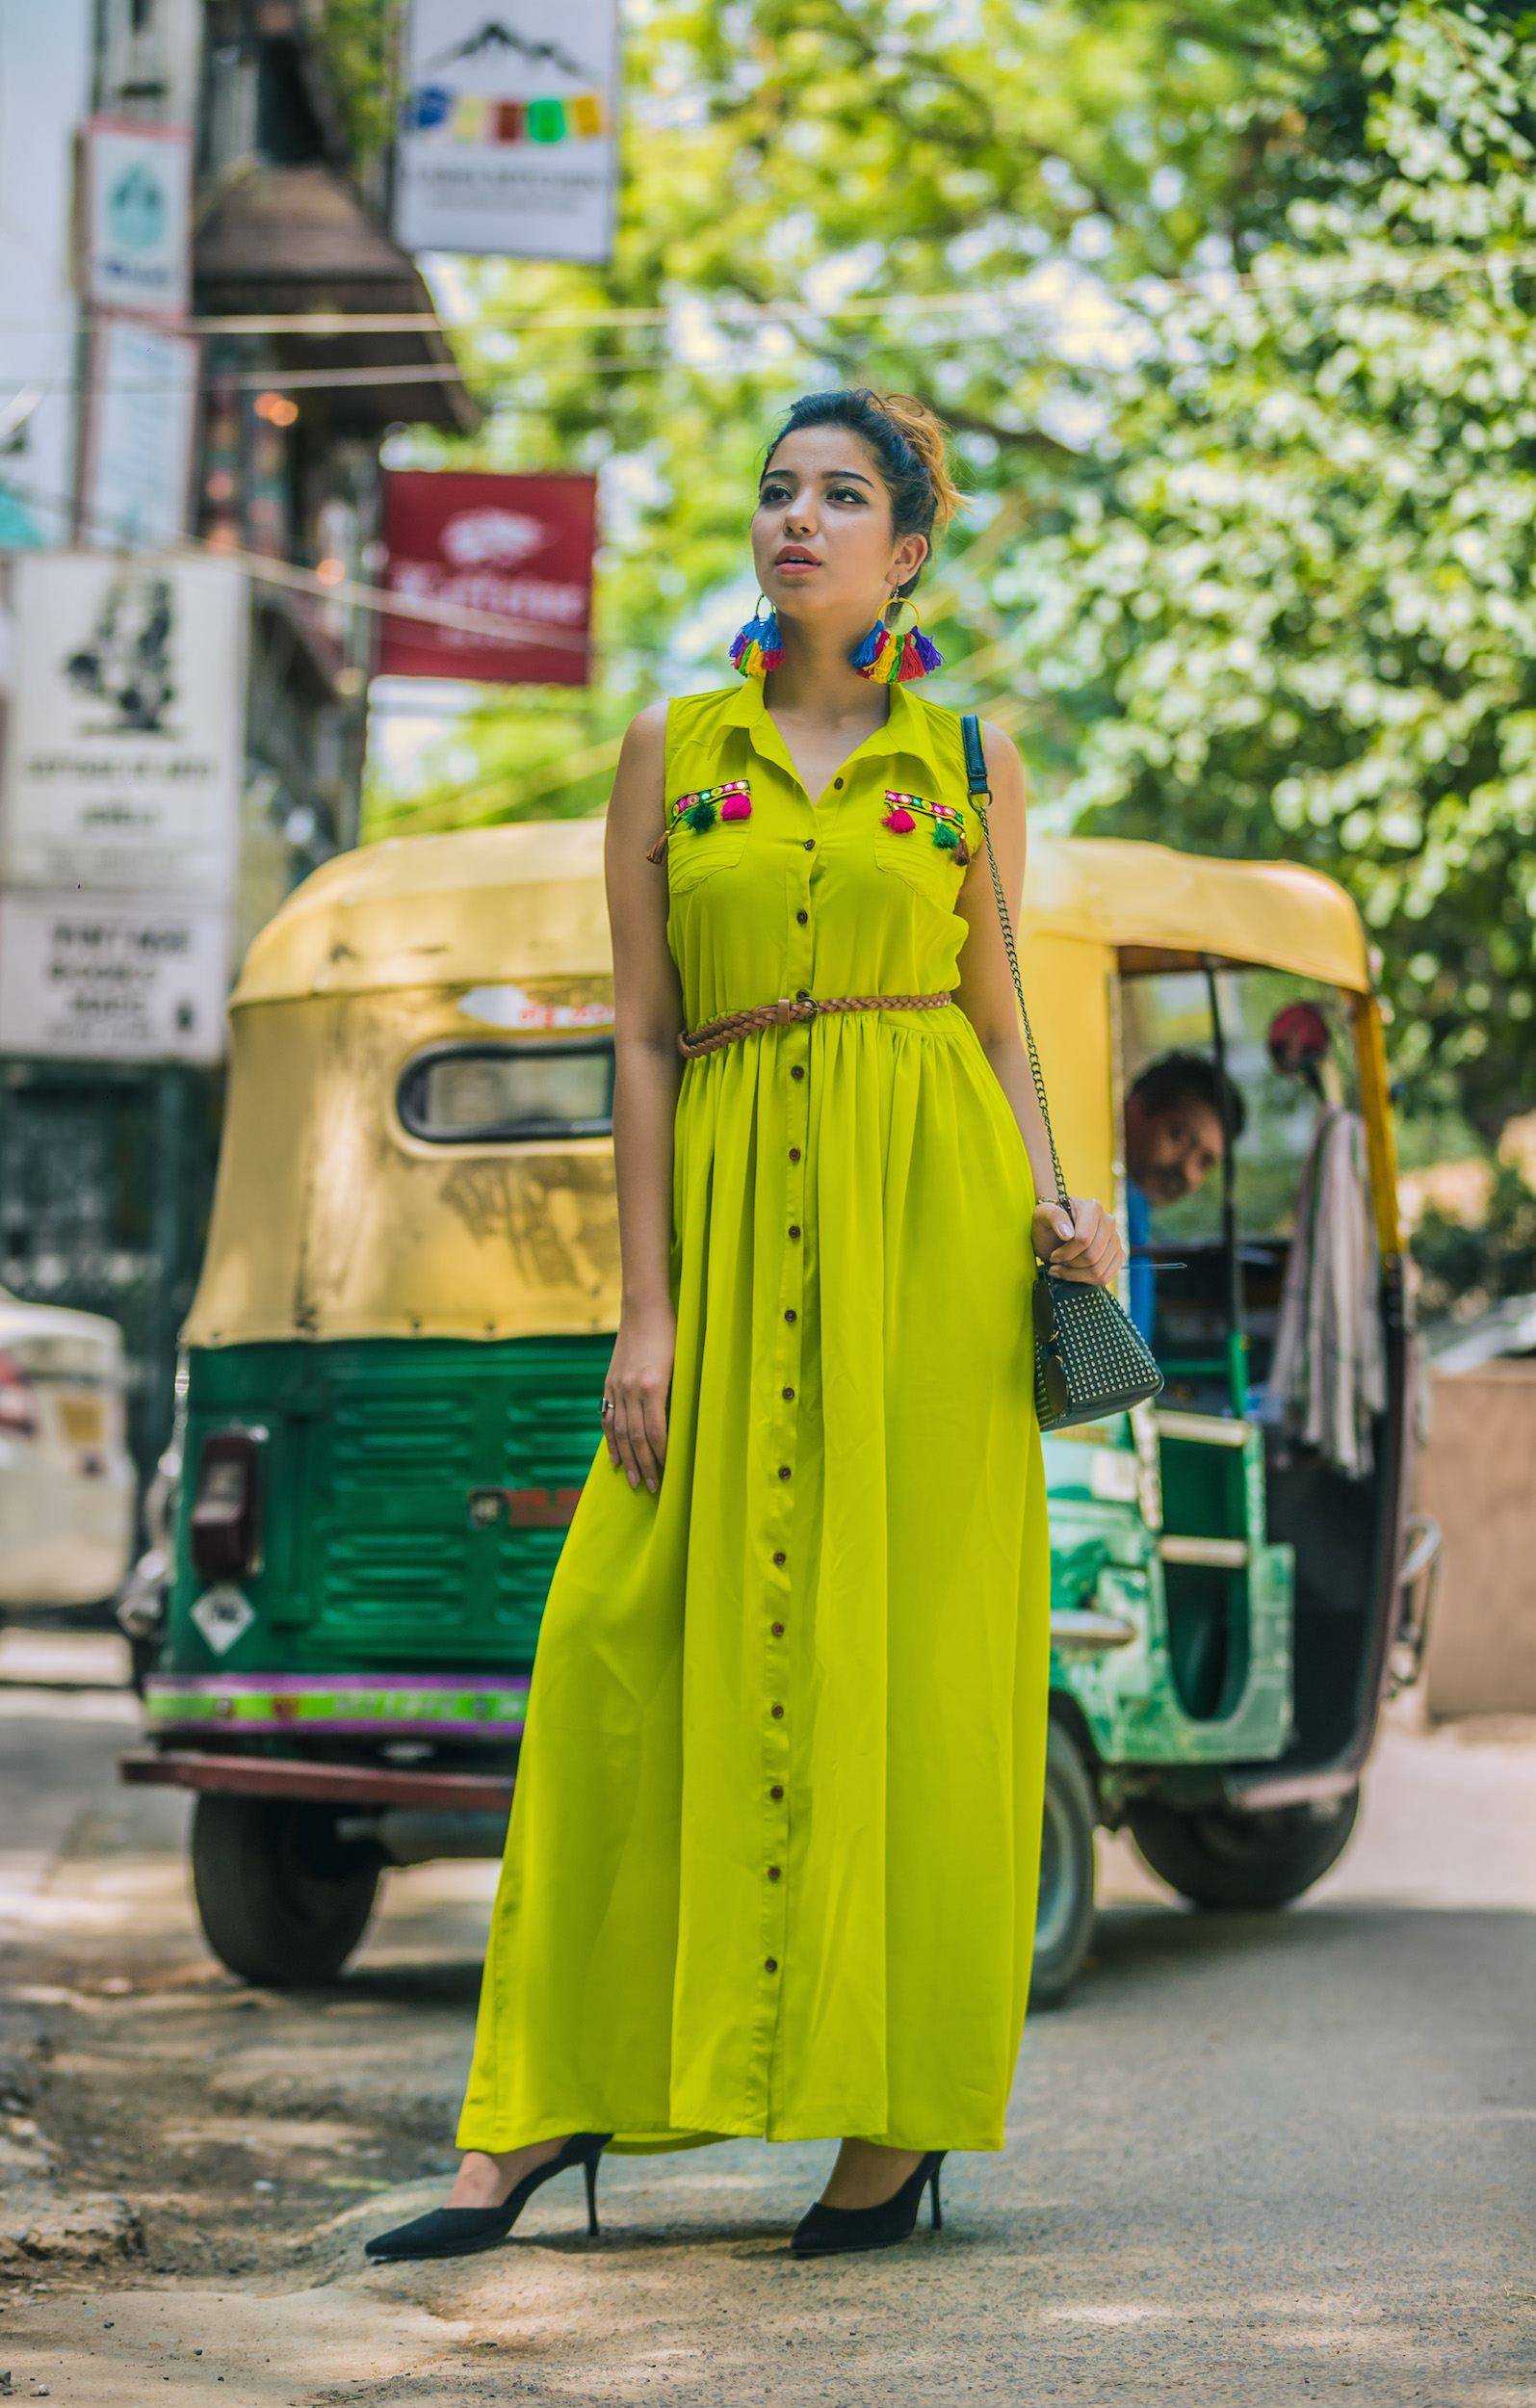 Chartreuse green tasseled maxi